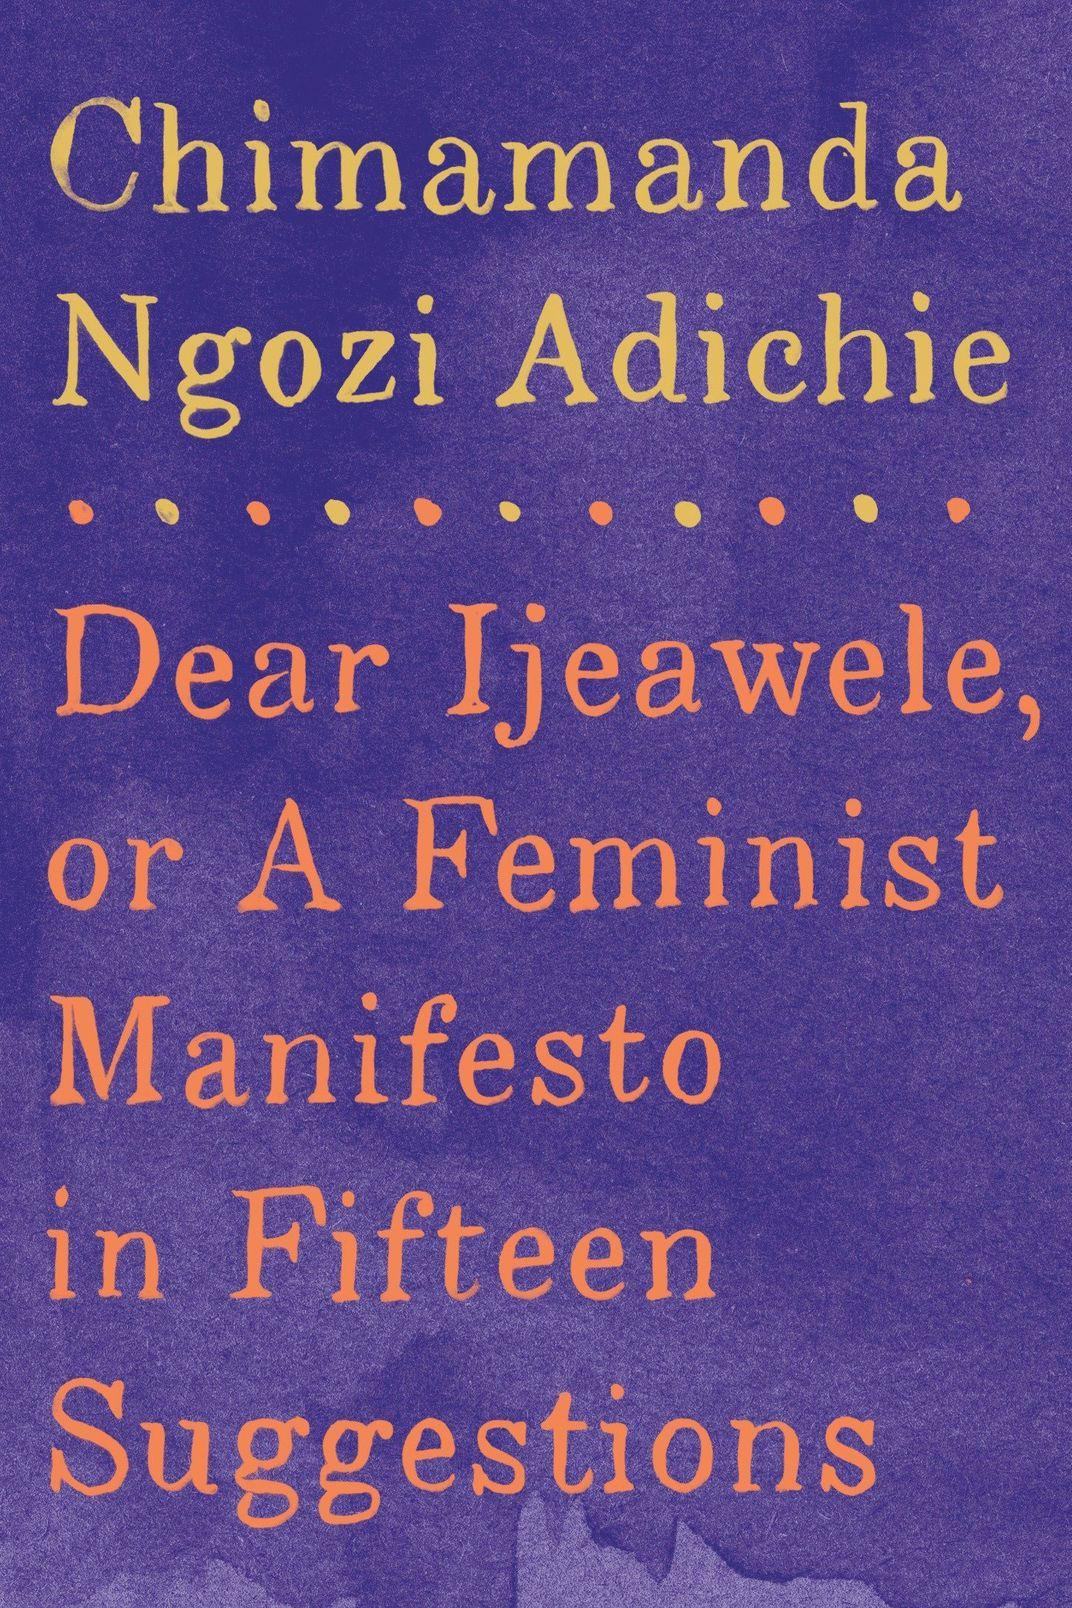 Dear Ijeawele, or a Feminist Manifesto in Fifteen Suggestions, by Chimamanda Ngozi Adichie